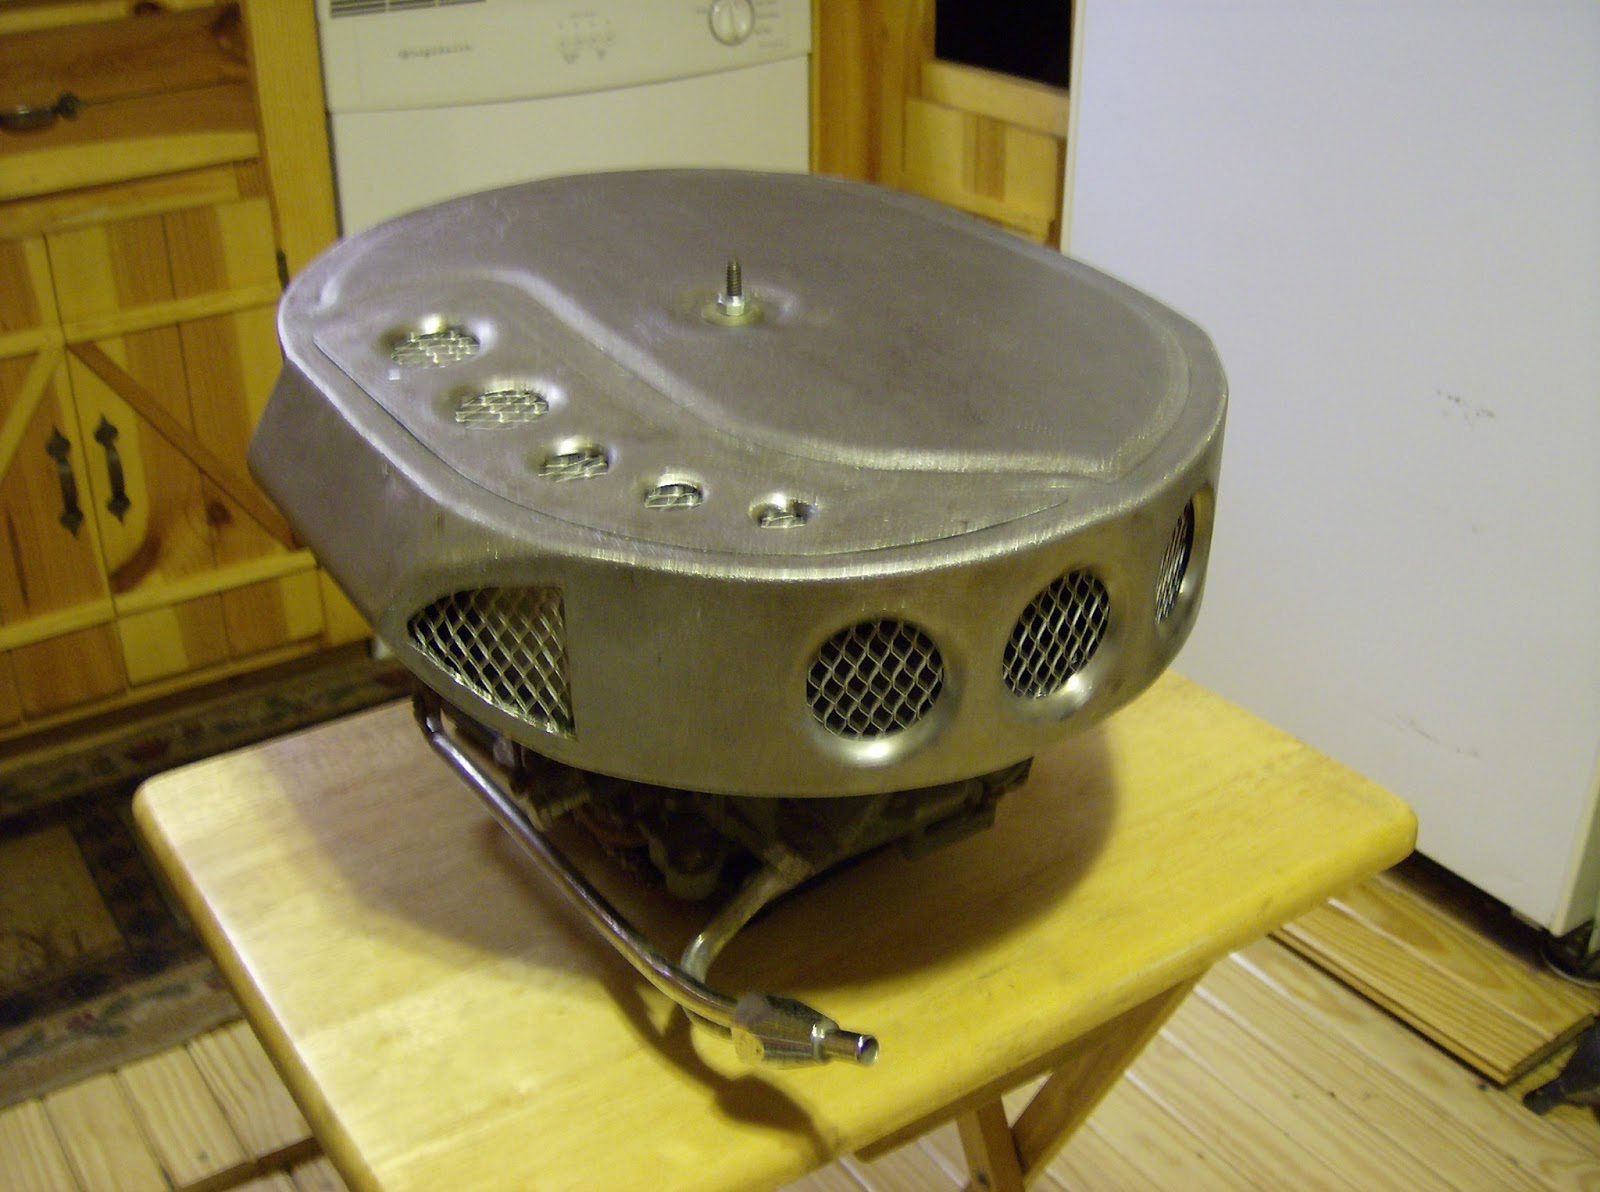 Custom Air Breather : Bh custom designs new aircleaner available